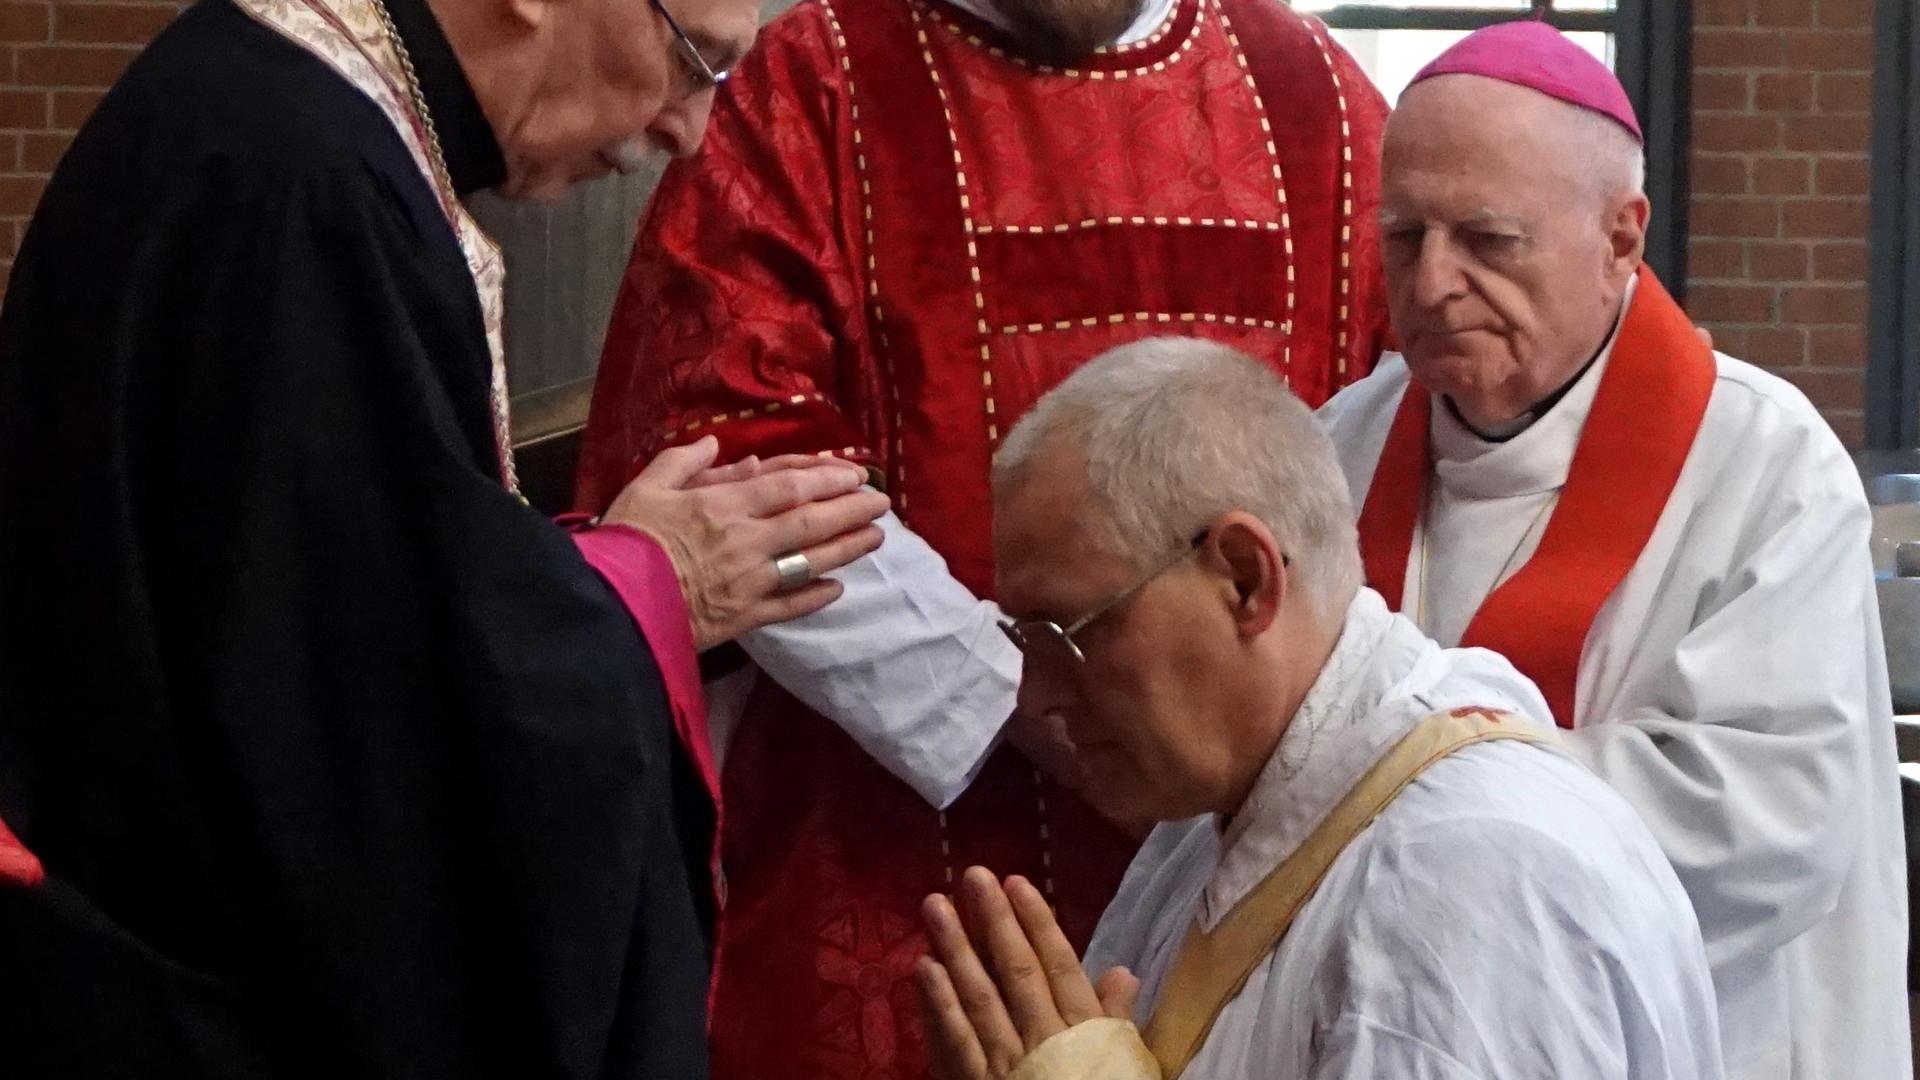 Handauflegung durch Presbyterium Prostatio Presbyterweihe Priesterweihe 2017 SJB Johannesbruderschaft